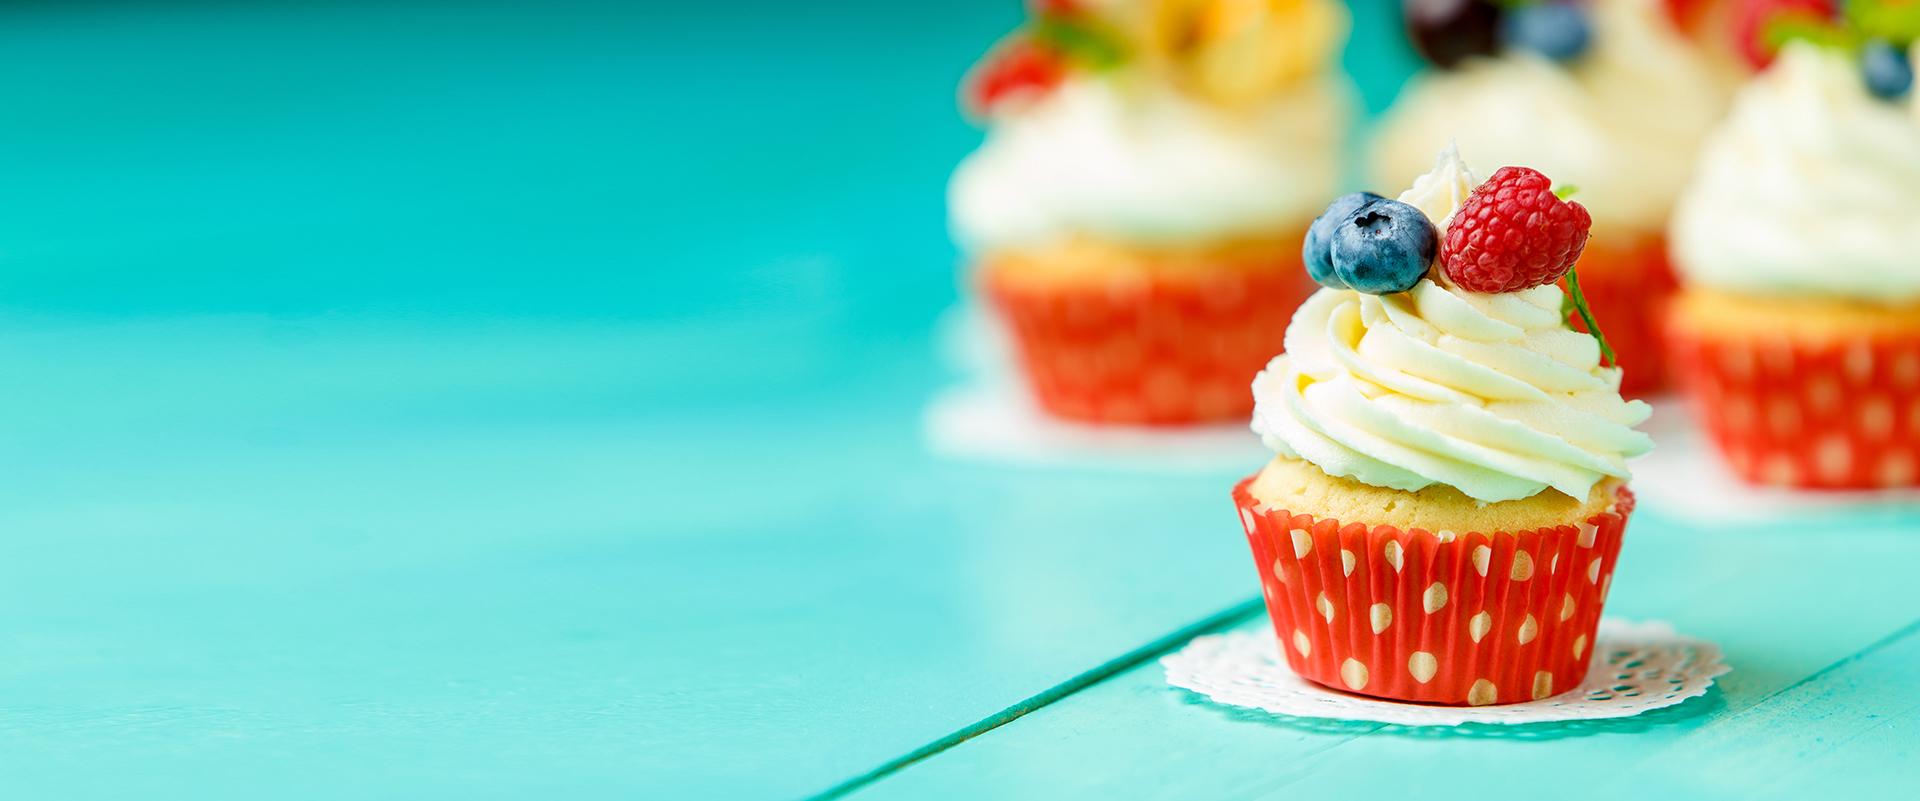 Cake Background Cake Dessert Food Background Image For